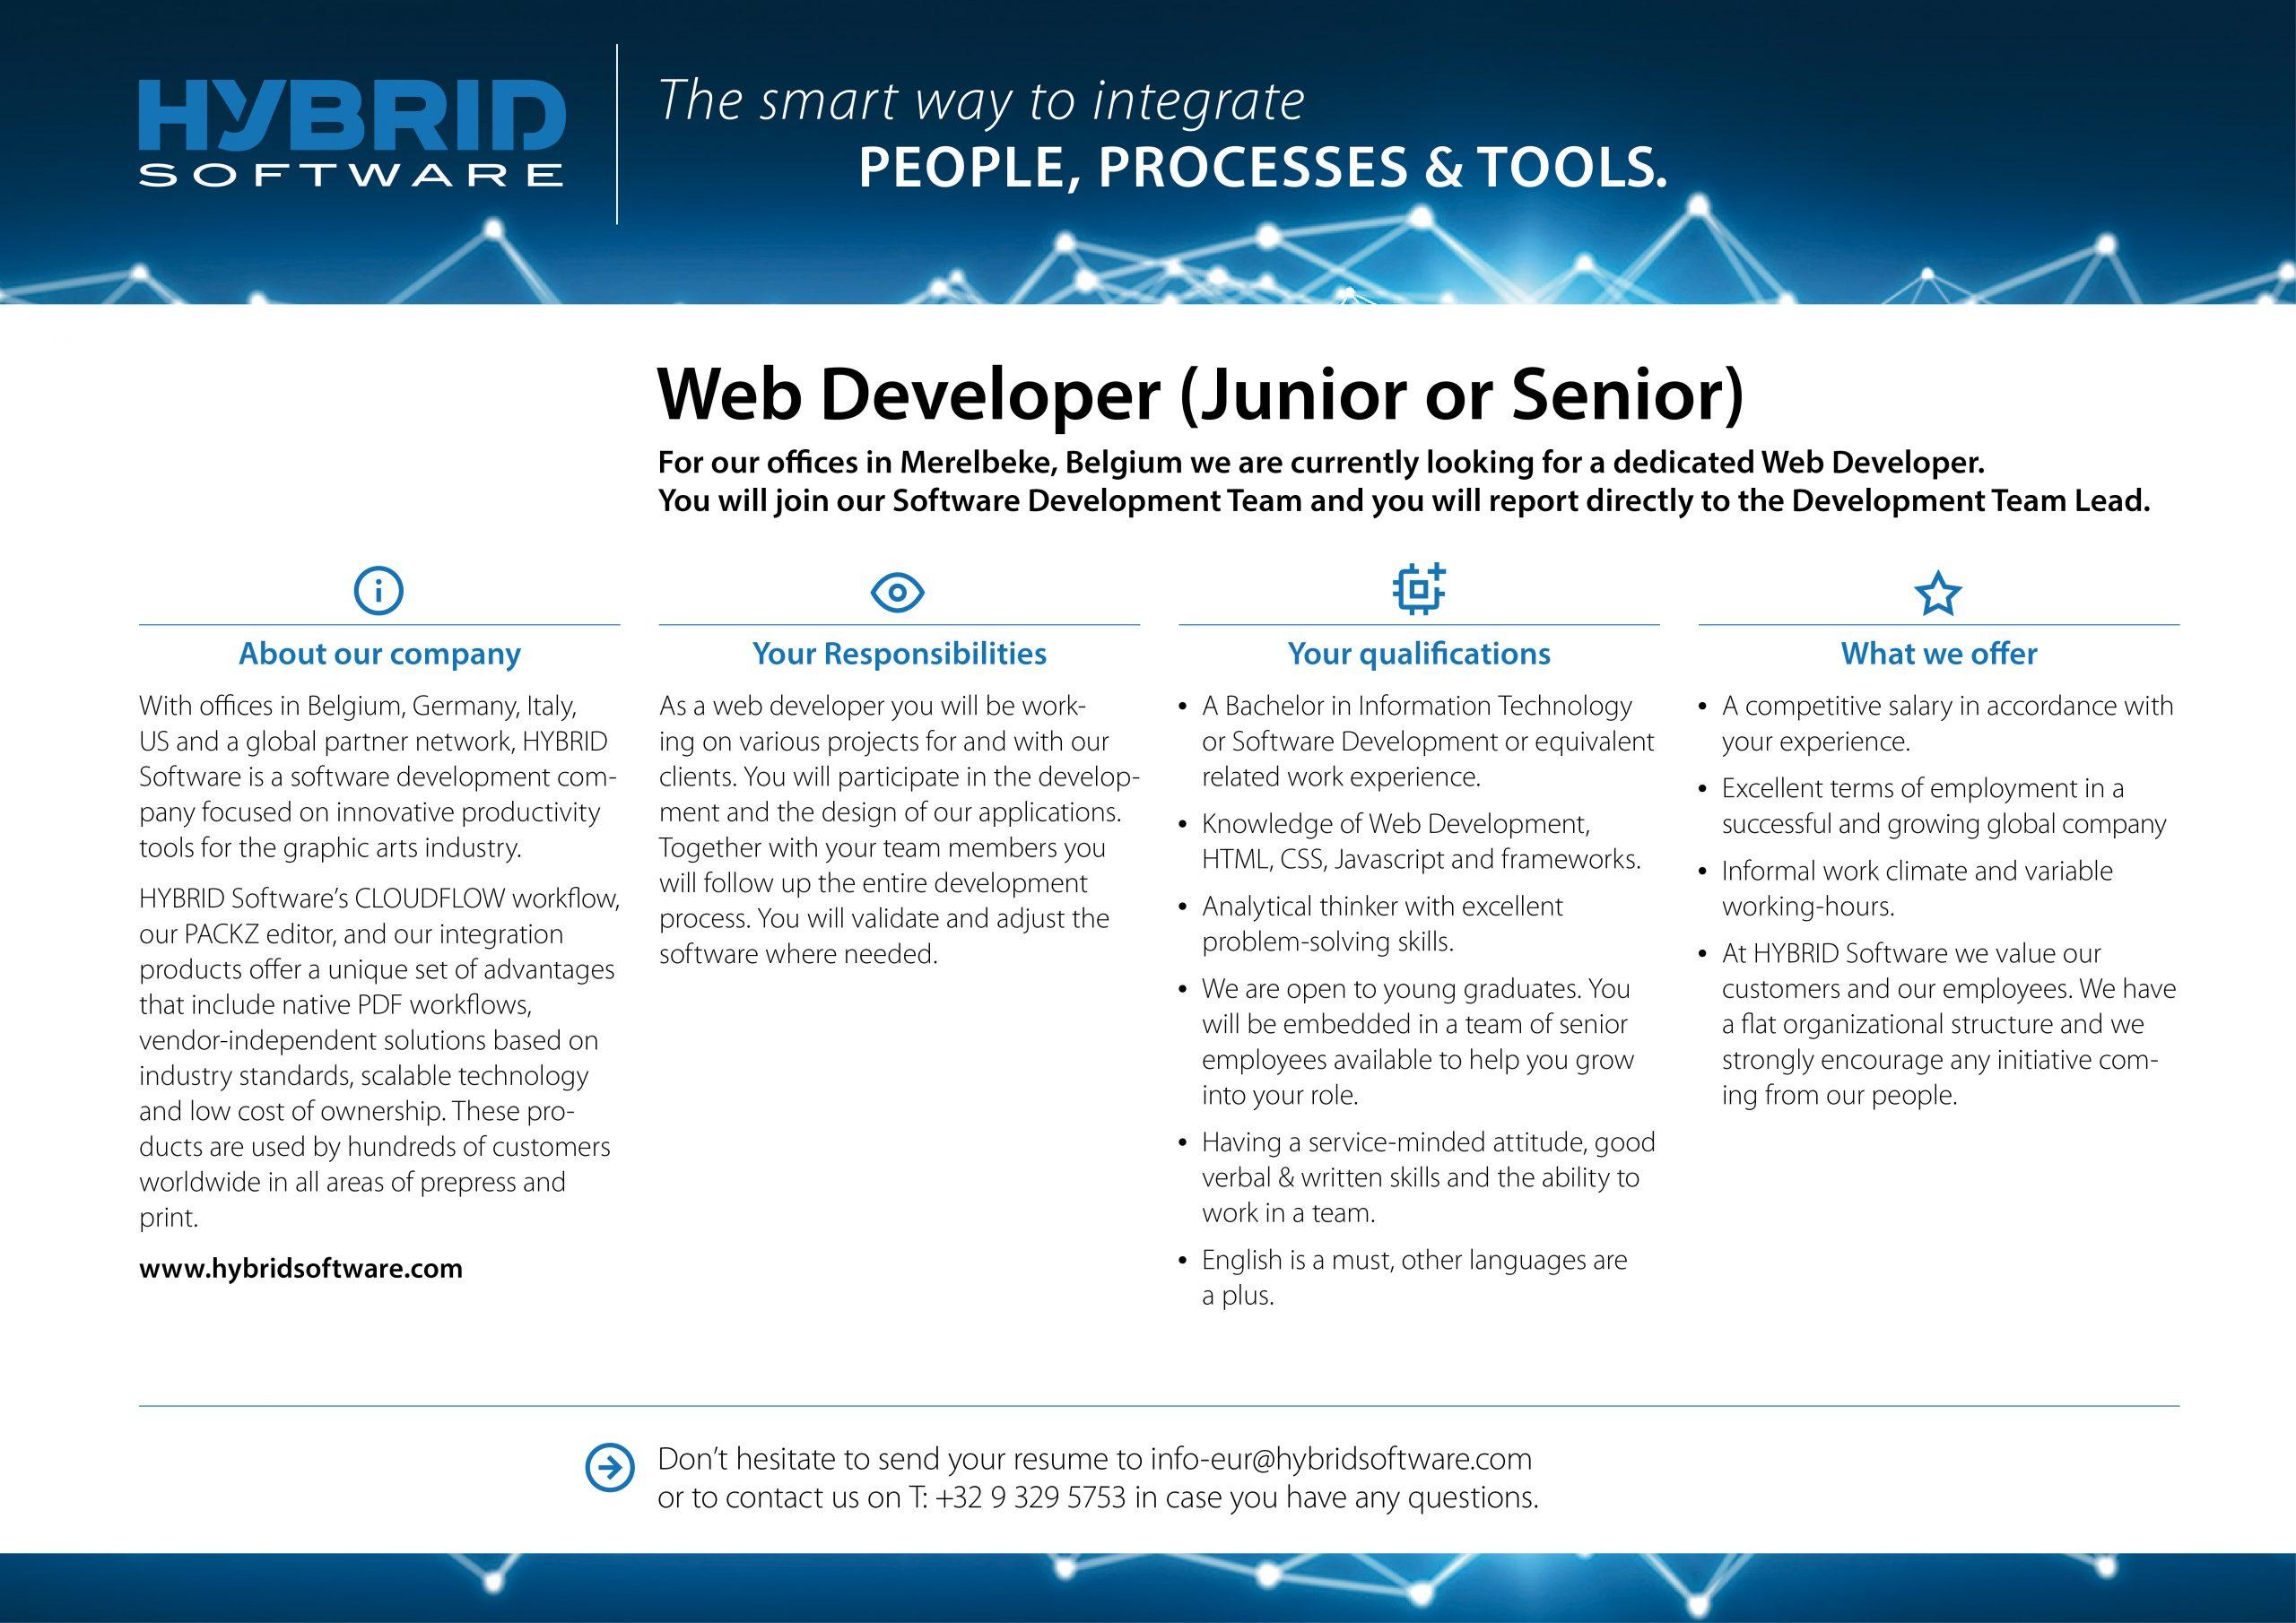 HYBRID Software Web Developer Job Ad